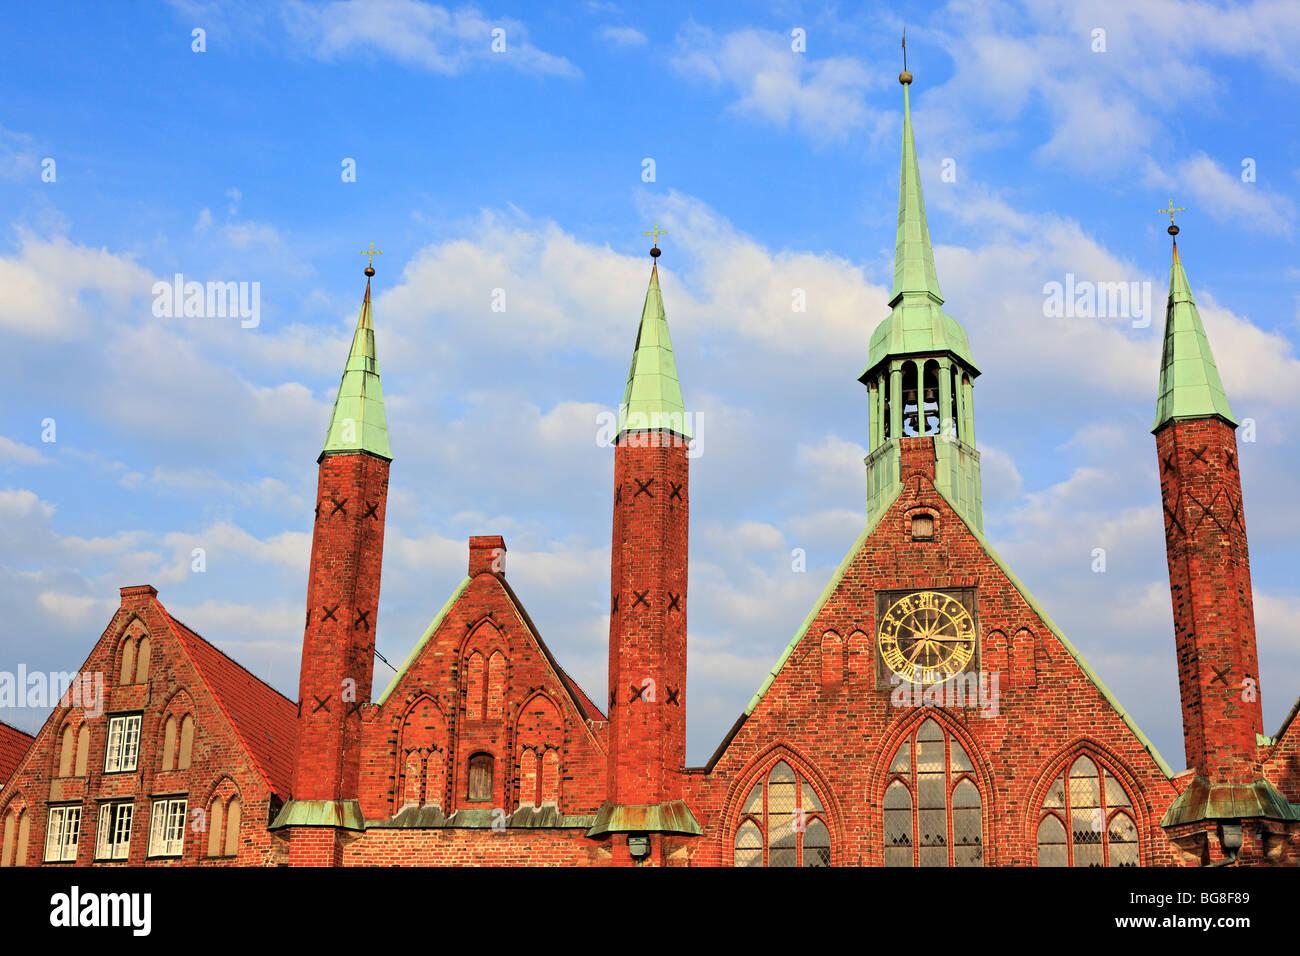 Hospital of the Holy Spirit (1260), Lubeck, Schleswig-Holstein, Germany - Stock Image